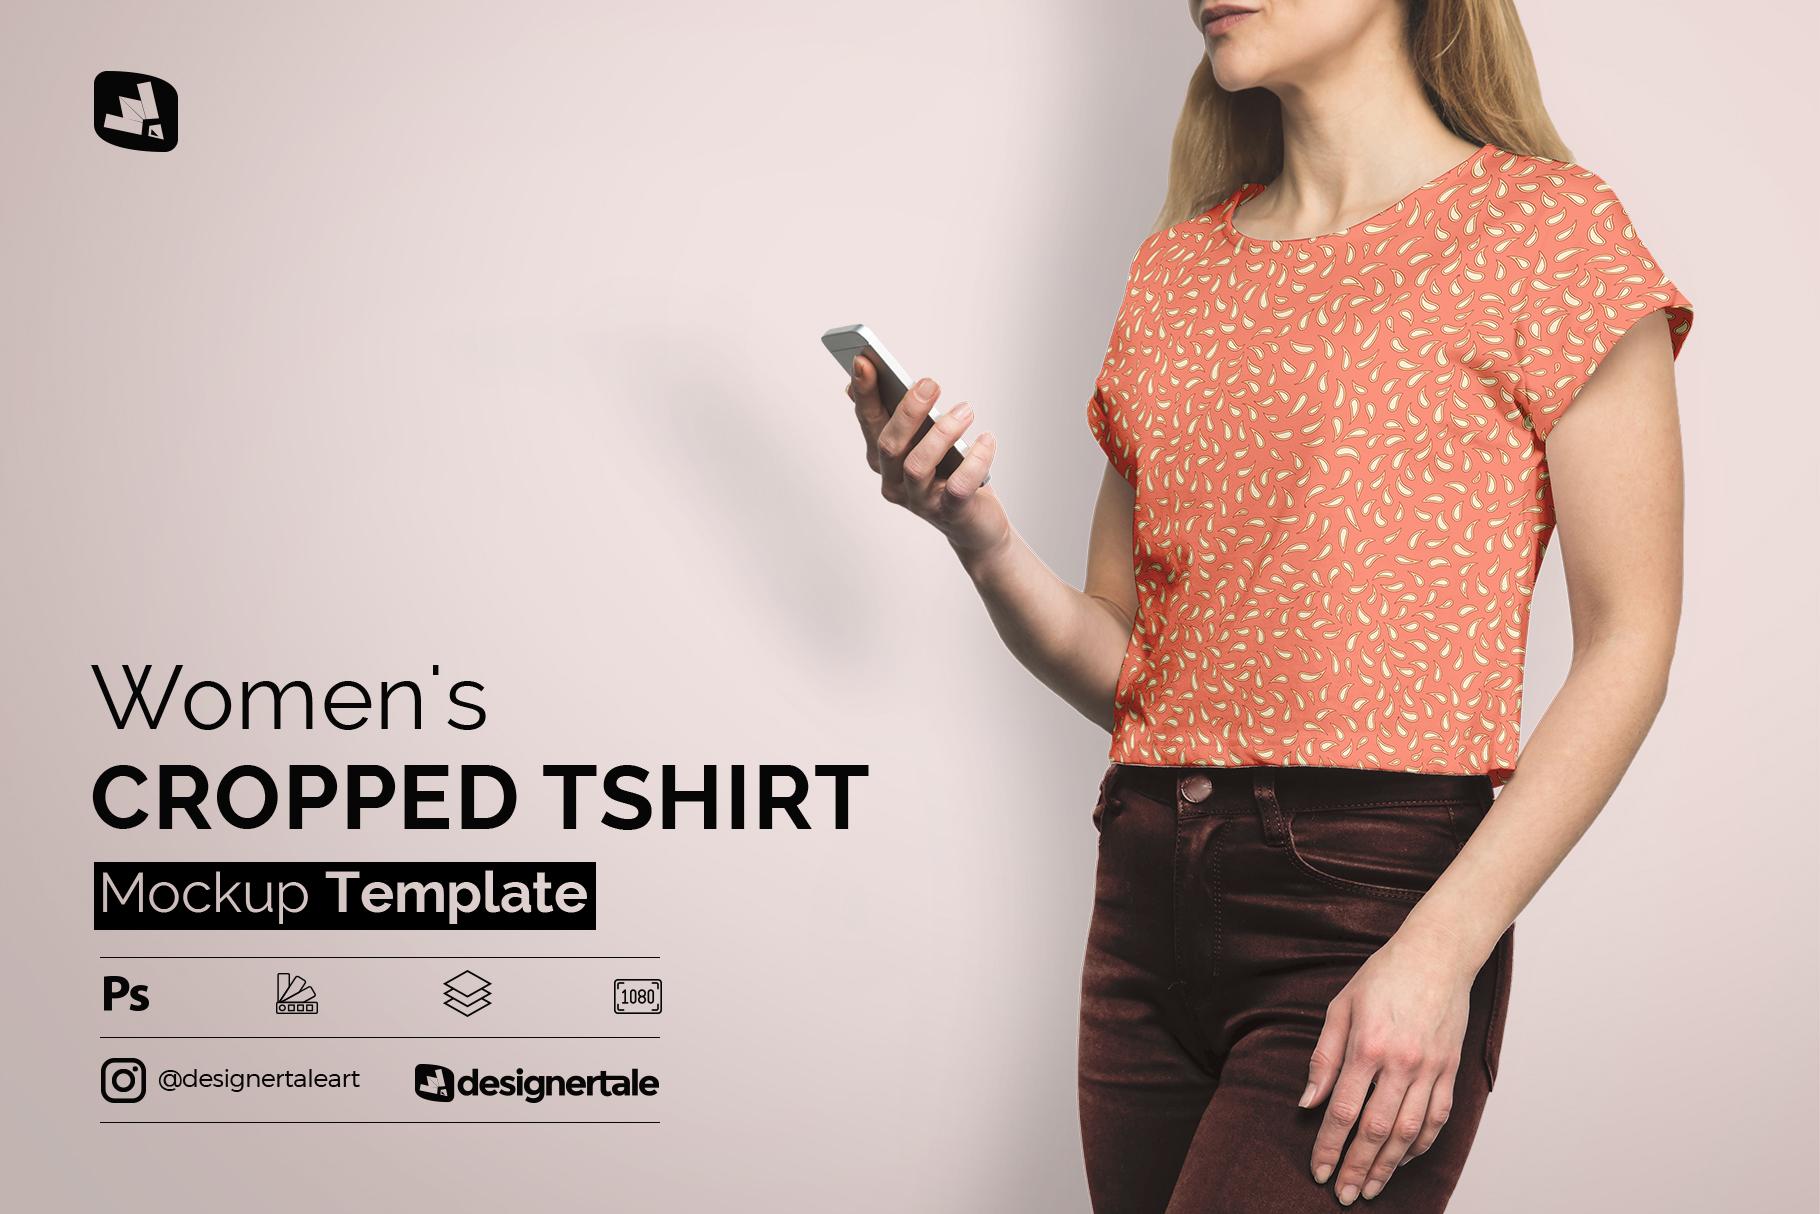 women's cropped tshirt mockup